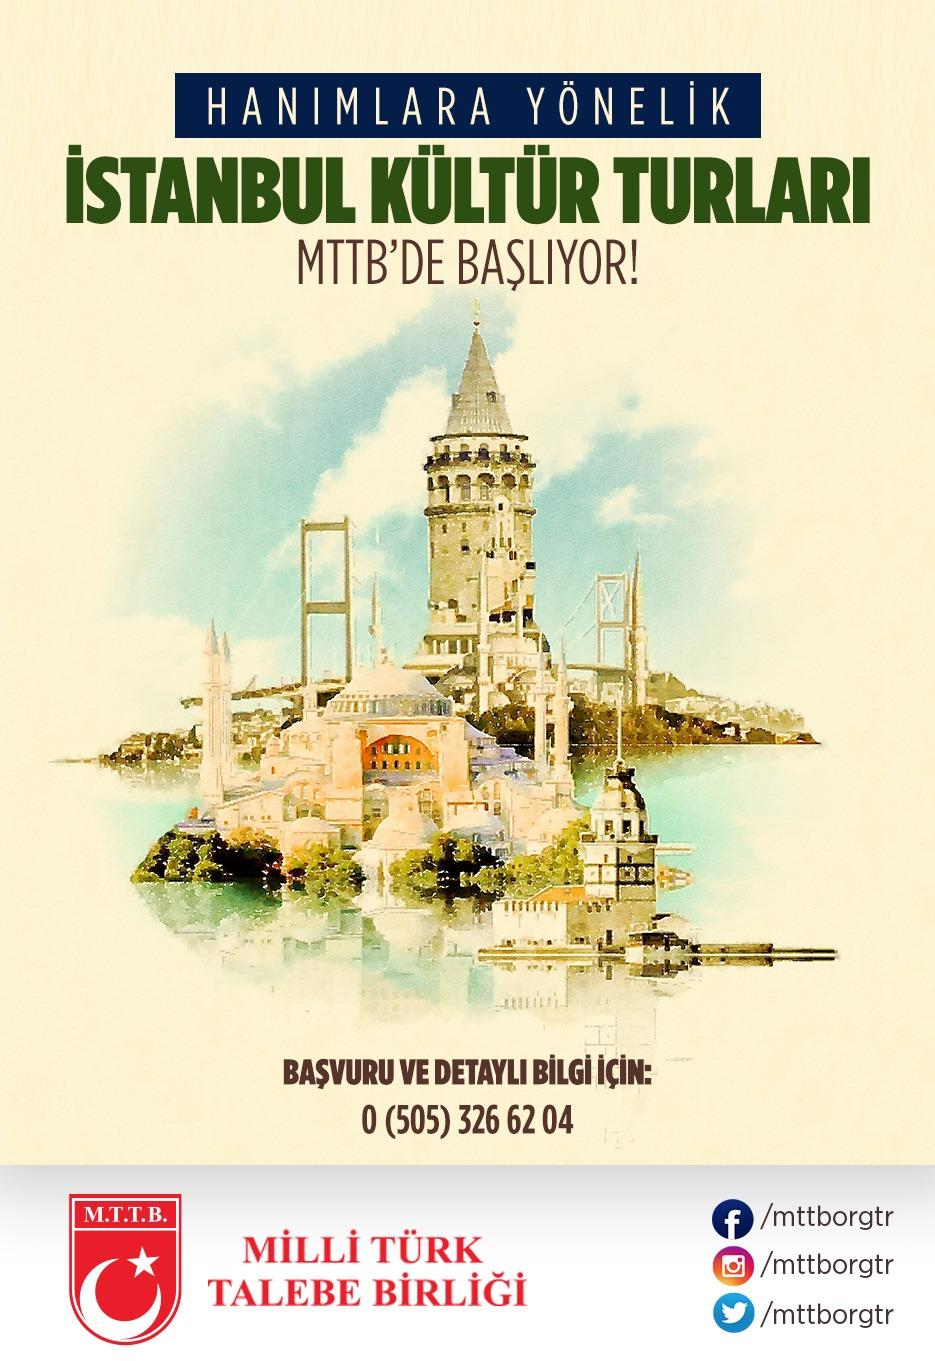 İstanbul Kültür Turları